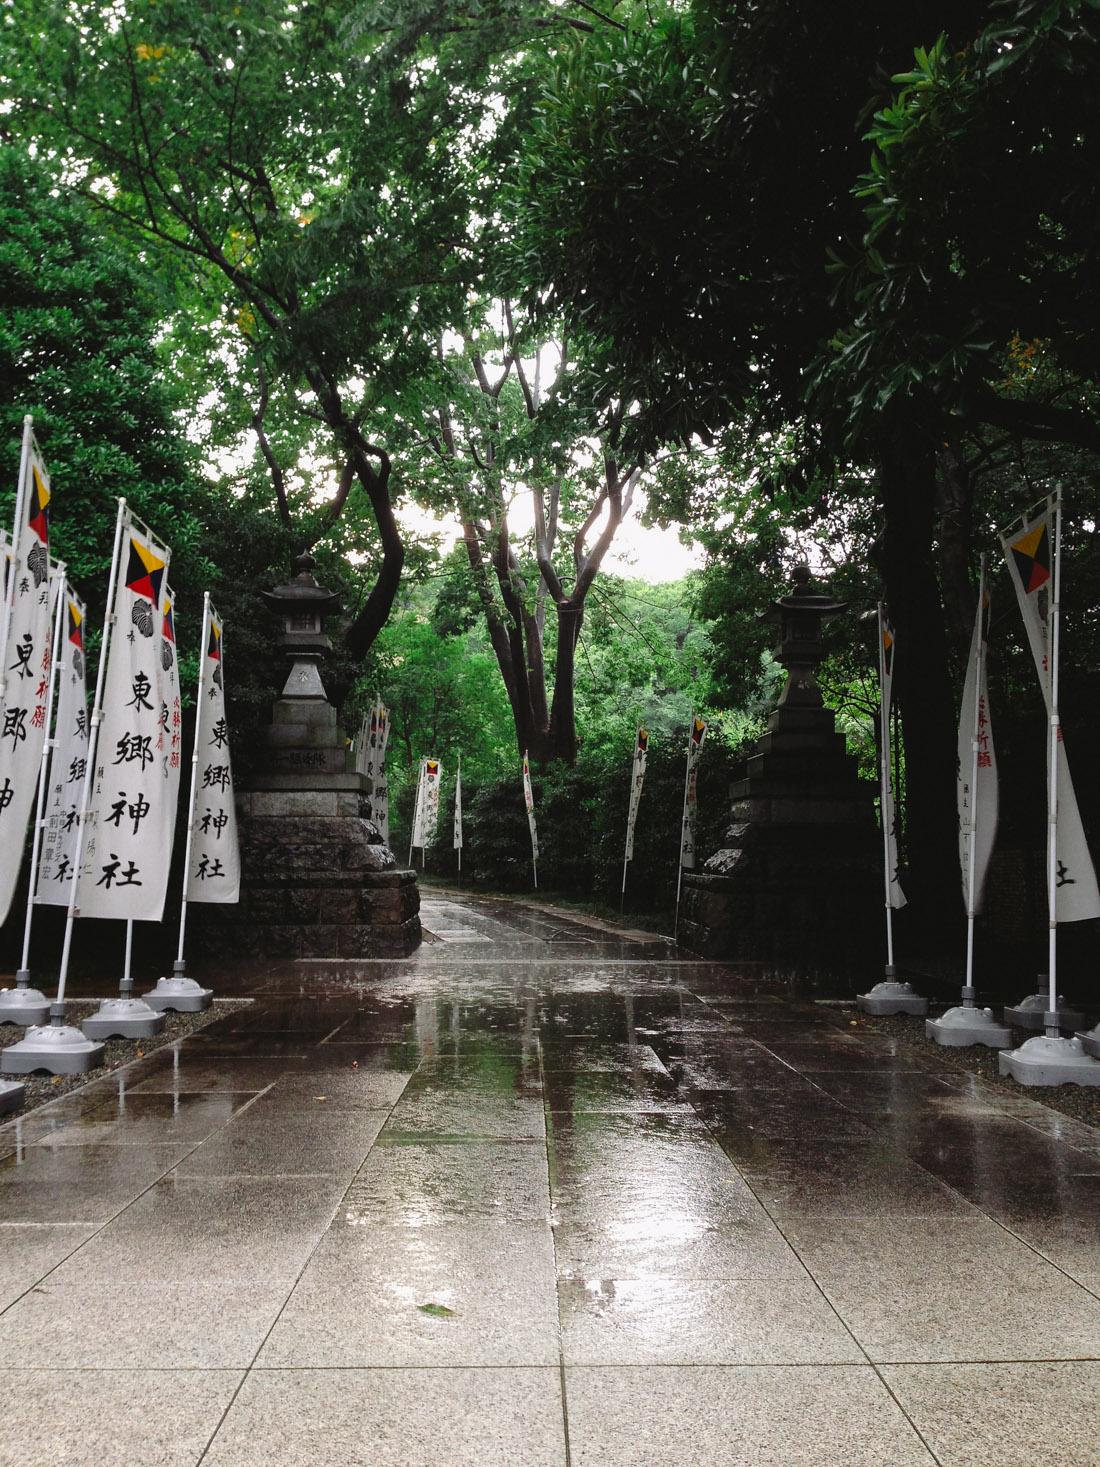 Entrance to the shrine